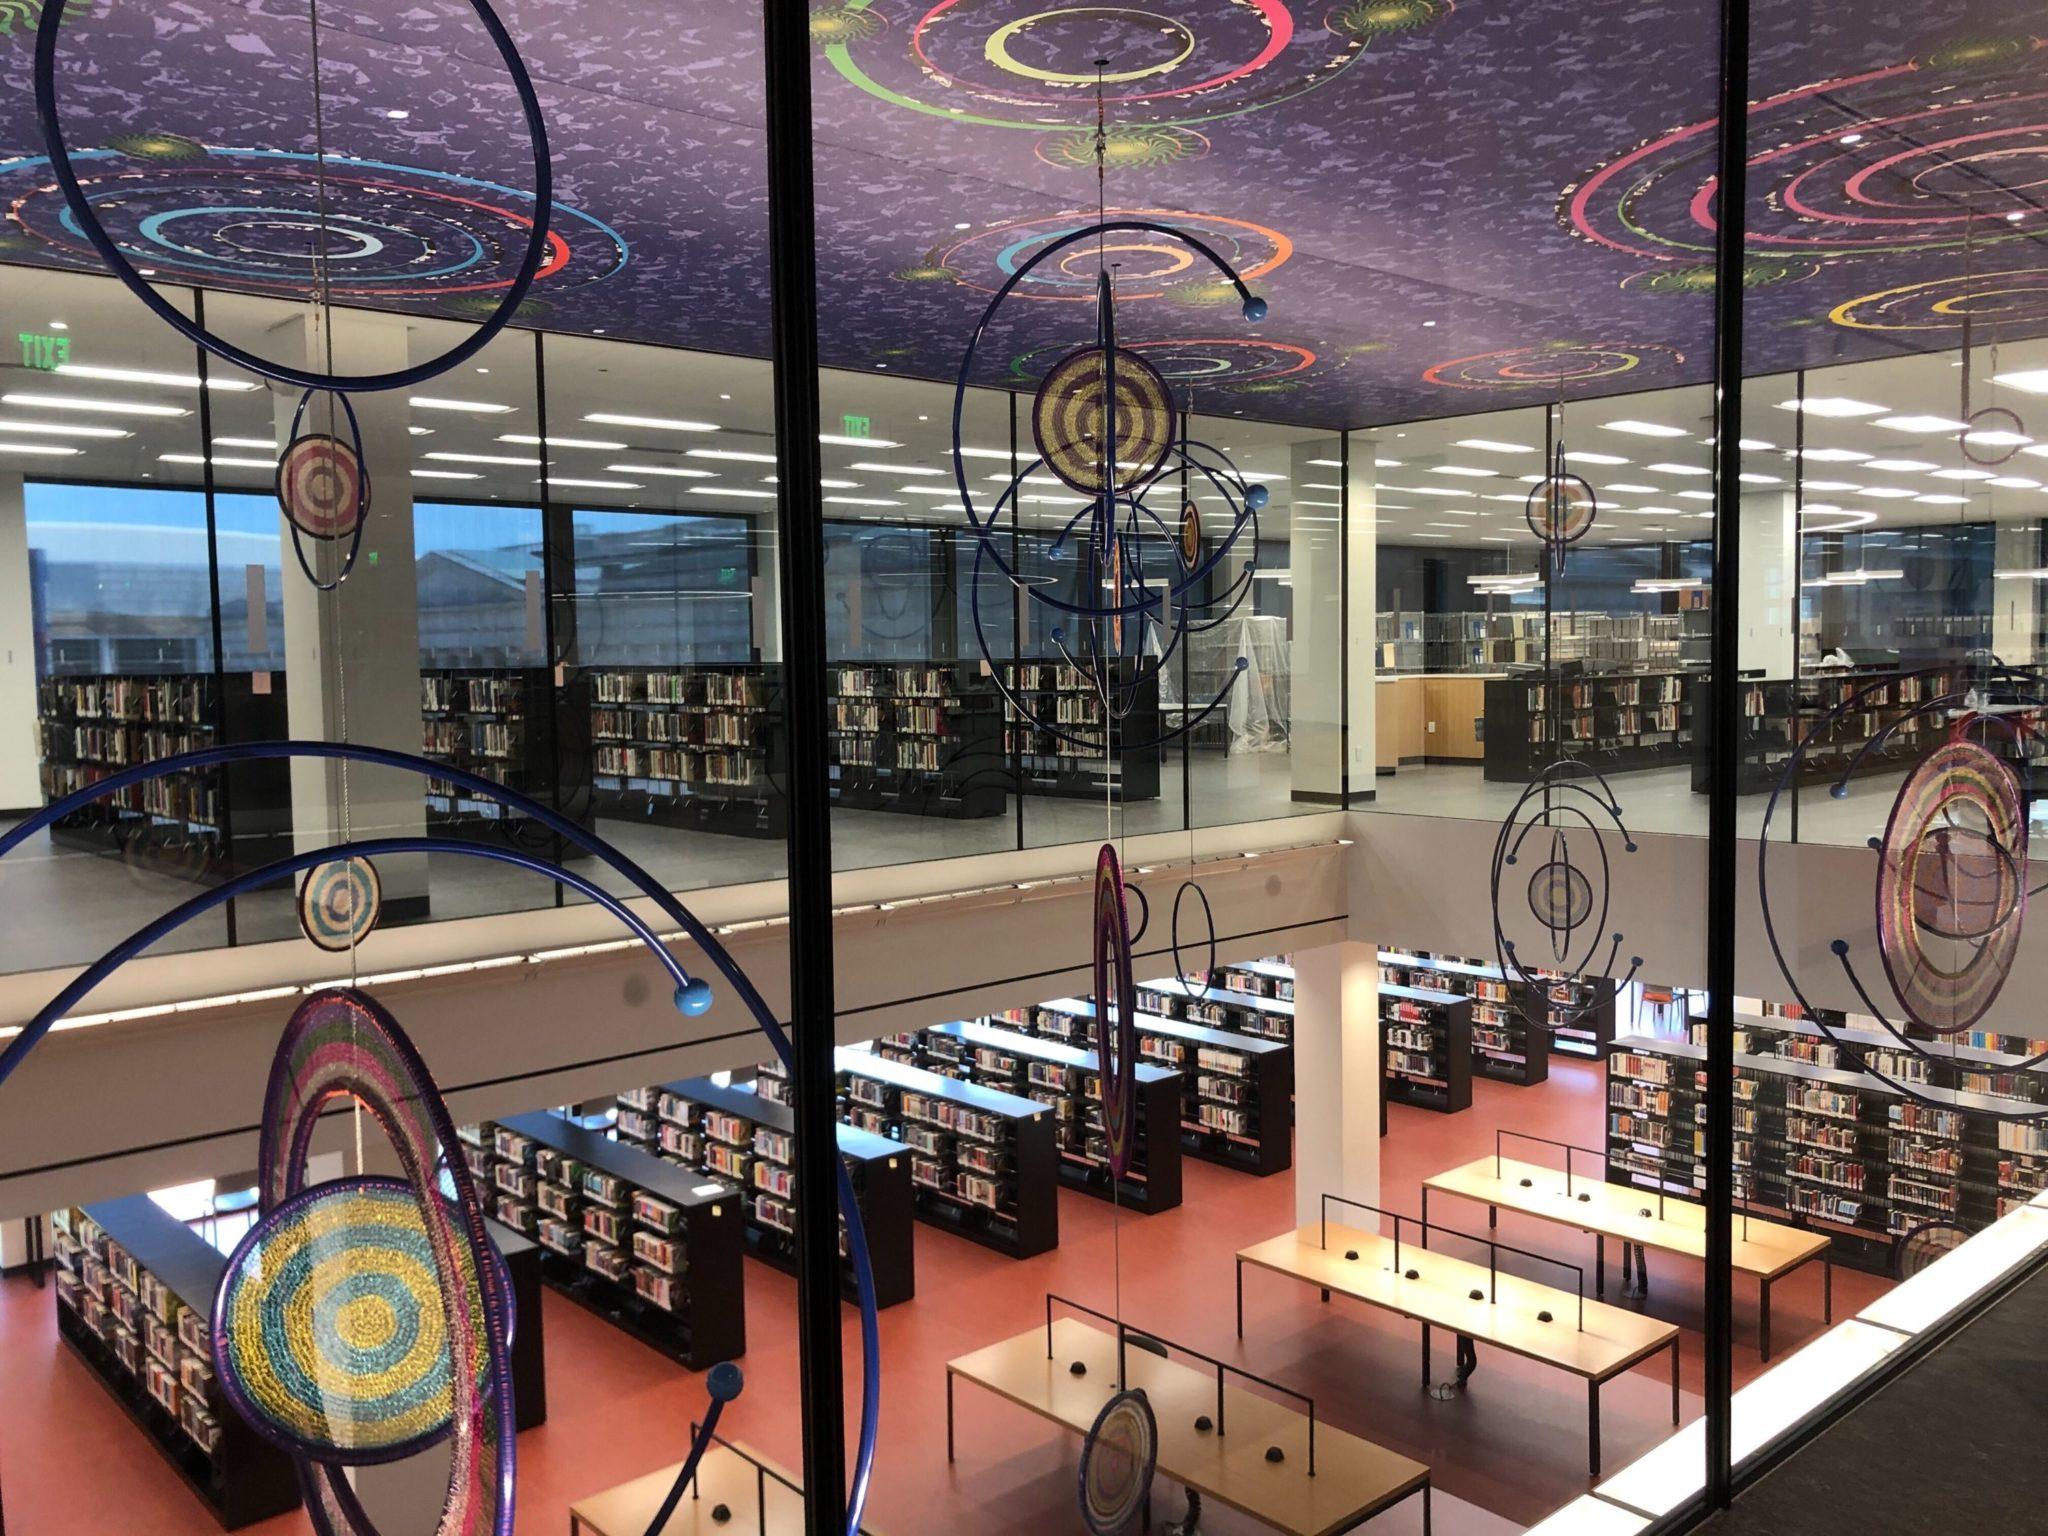 PHOTOS: Look Inside the MLK Library's 1 Million Renovation